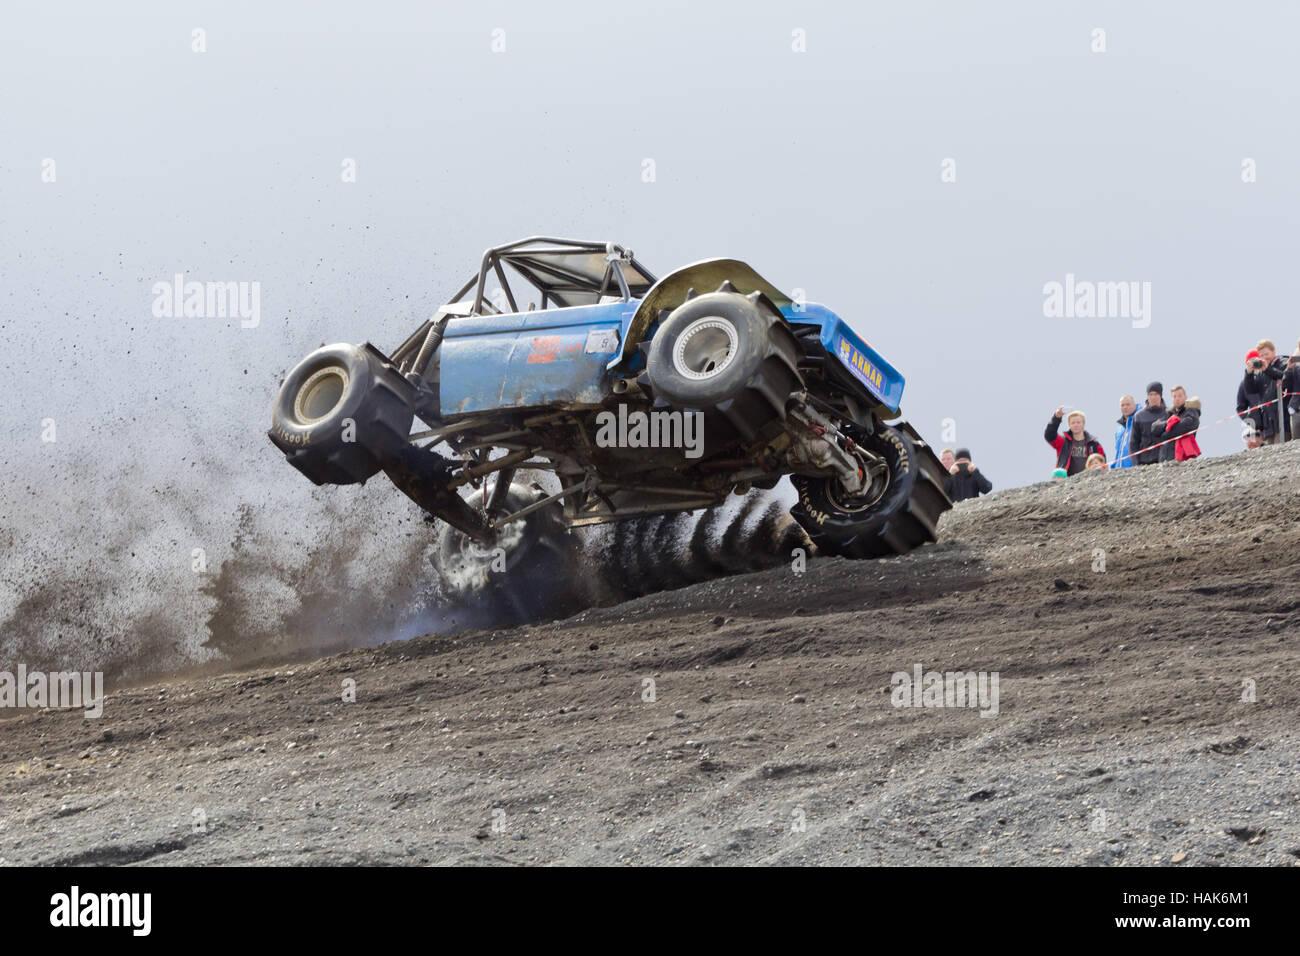 Formula off road racing in Hella 2014 - Stock Image